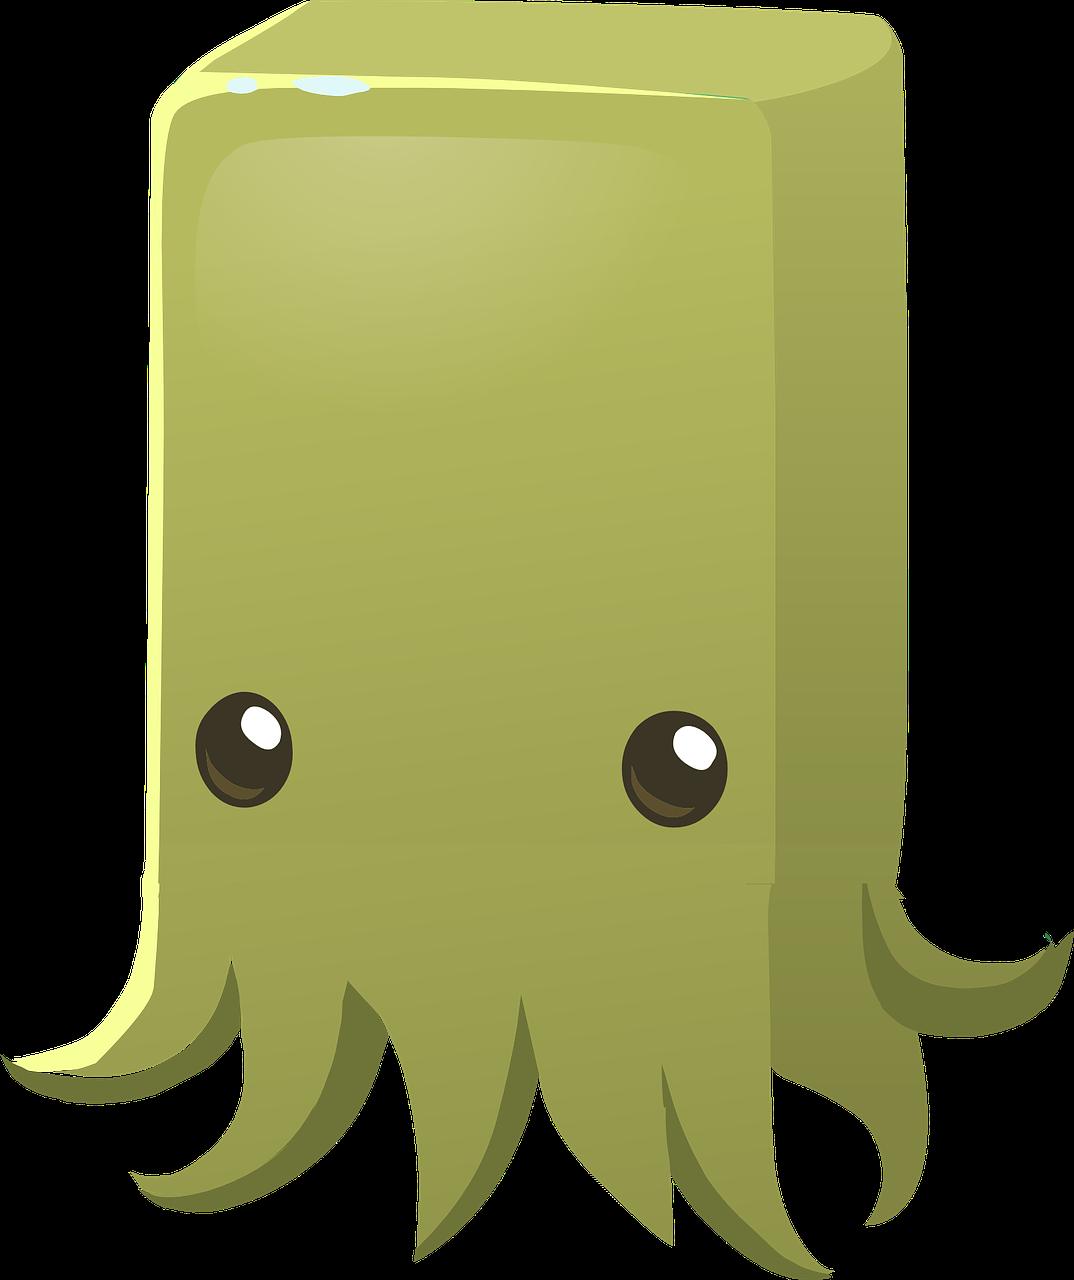 Octopus clipart maroon. Fantasy cartoon transparent image